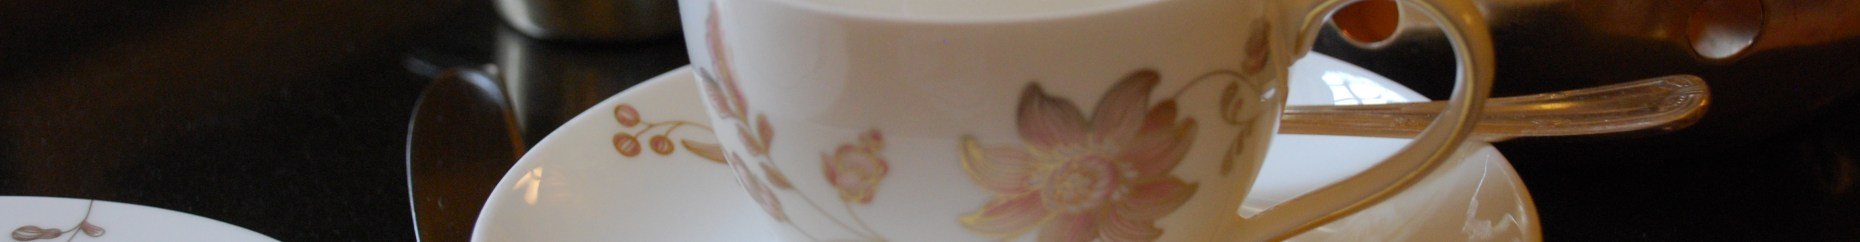 Tea at The Taj: Relax and Indulge